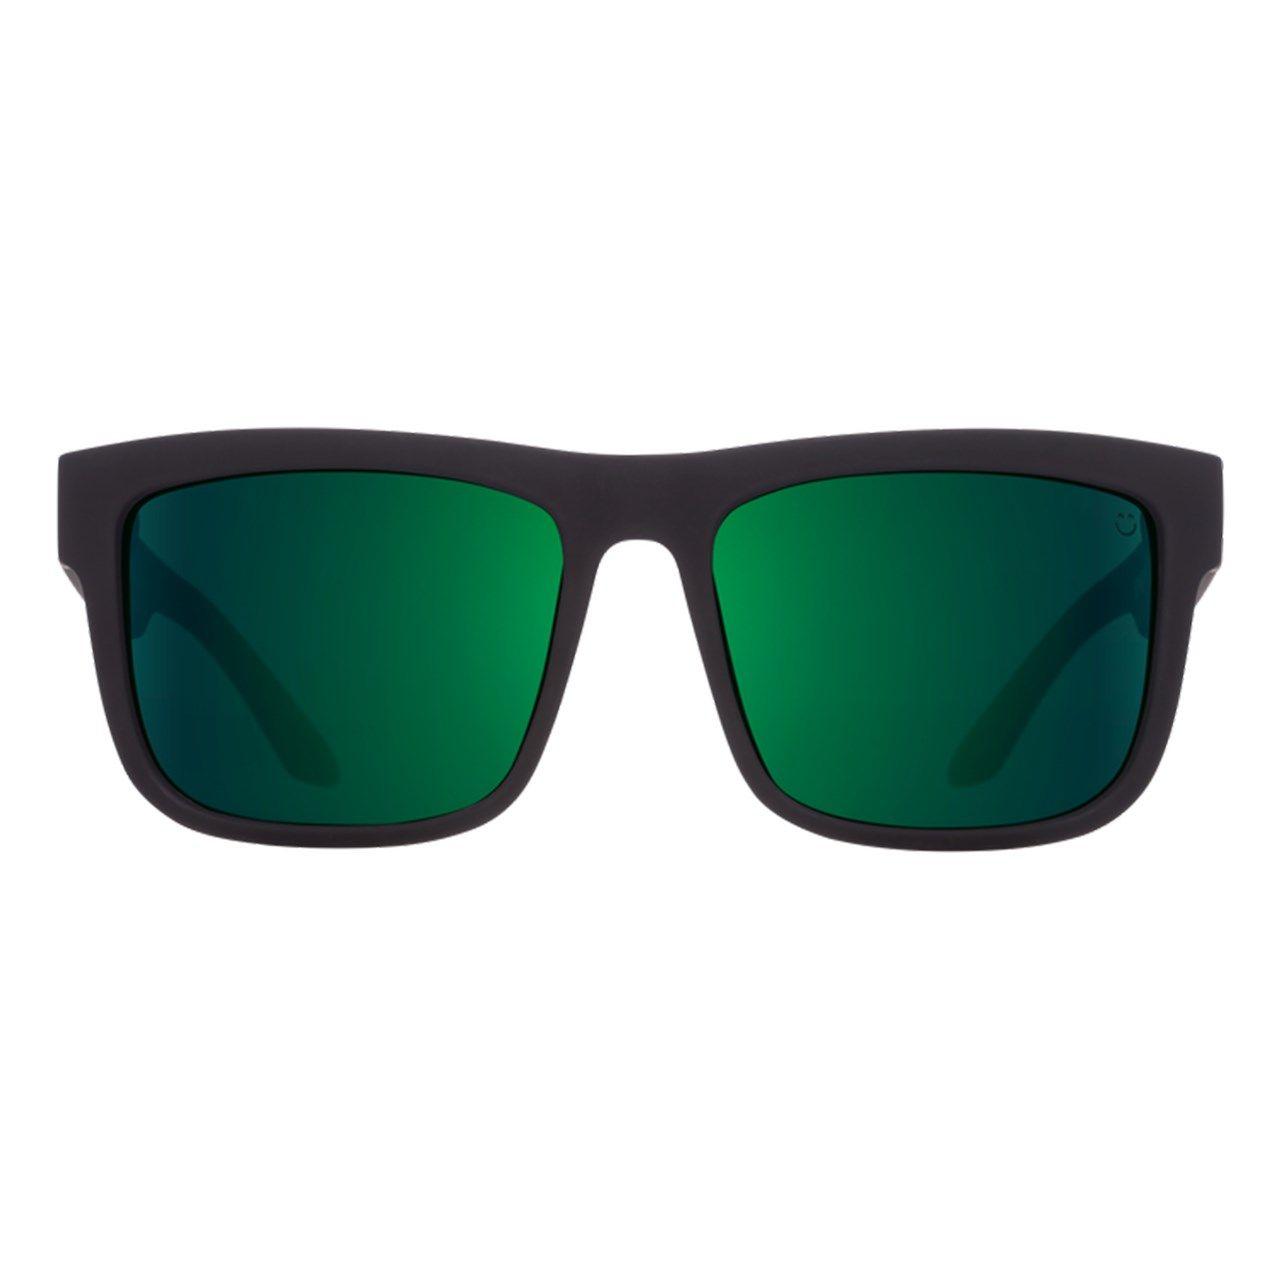 عینک آفتابی اسپای سری Discord مدلSoft Matte Black Green Fade Happy Gray Green Green Flash -  - 1